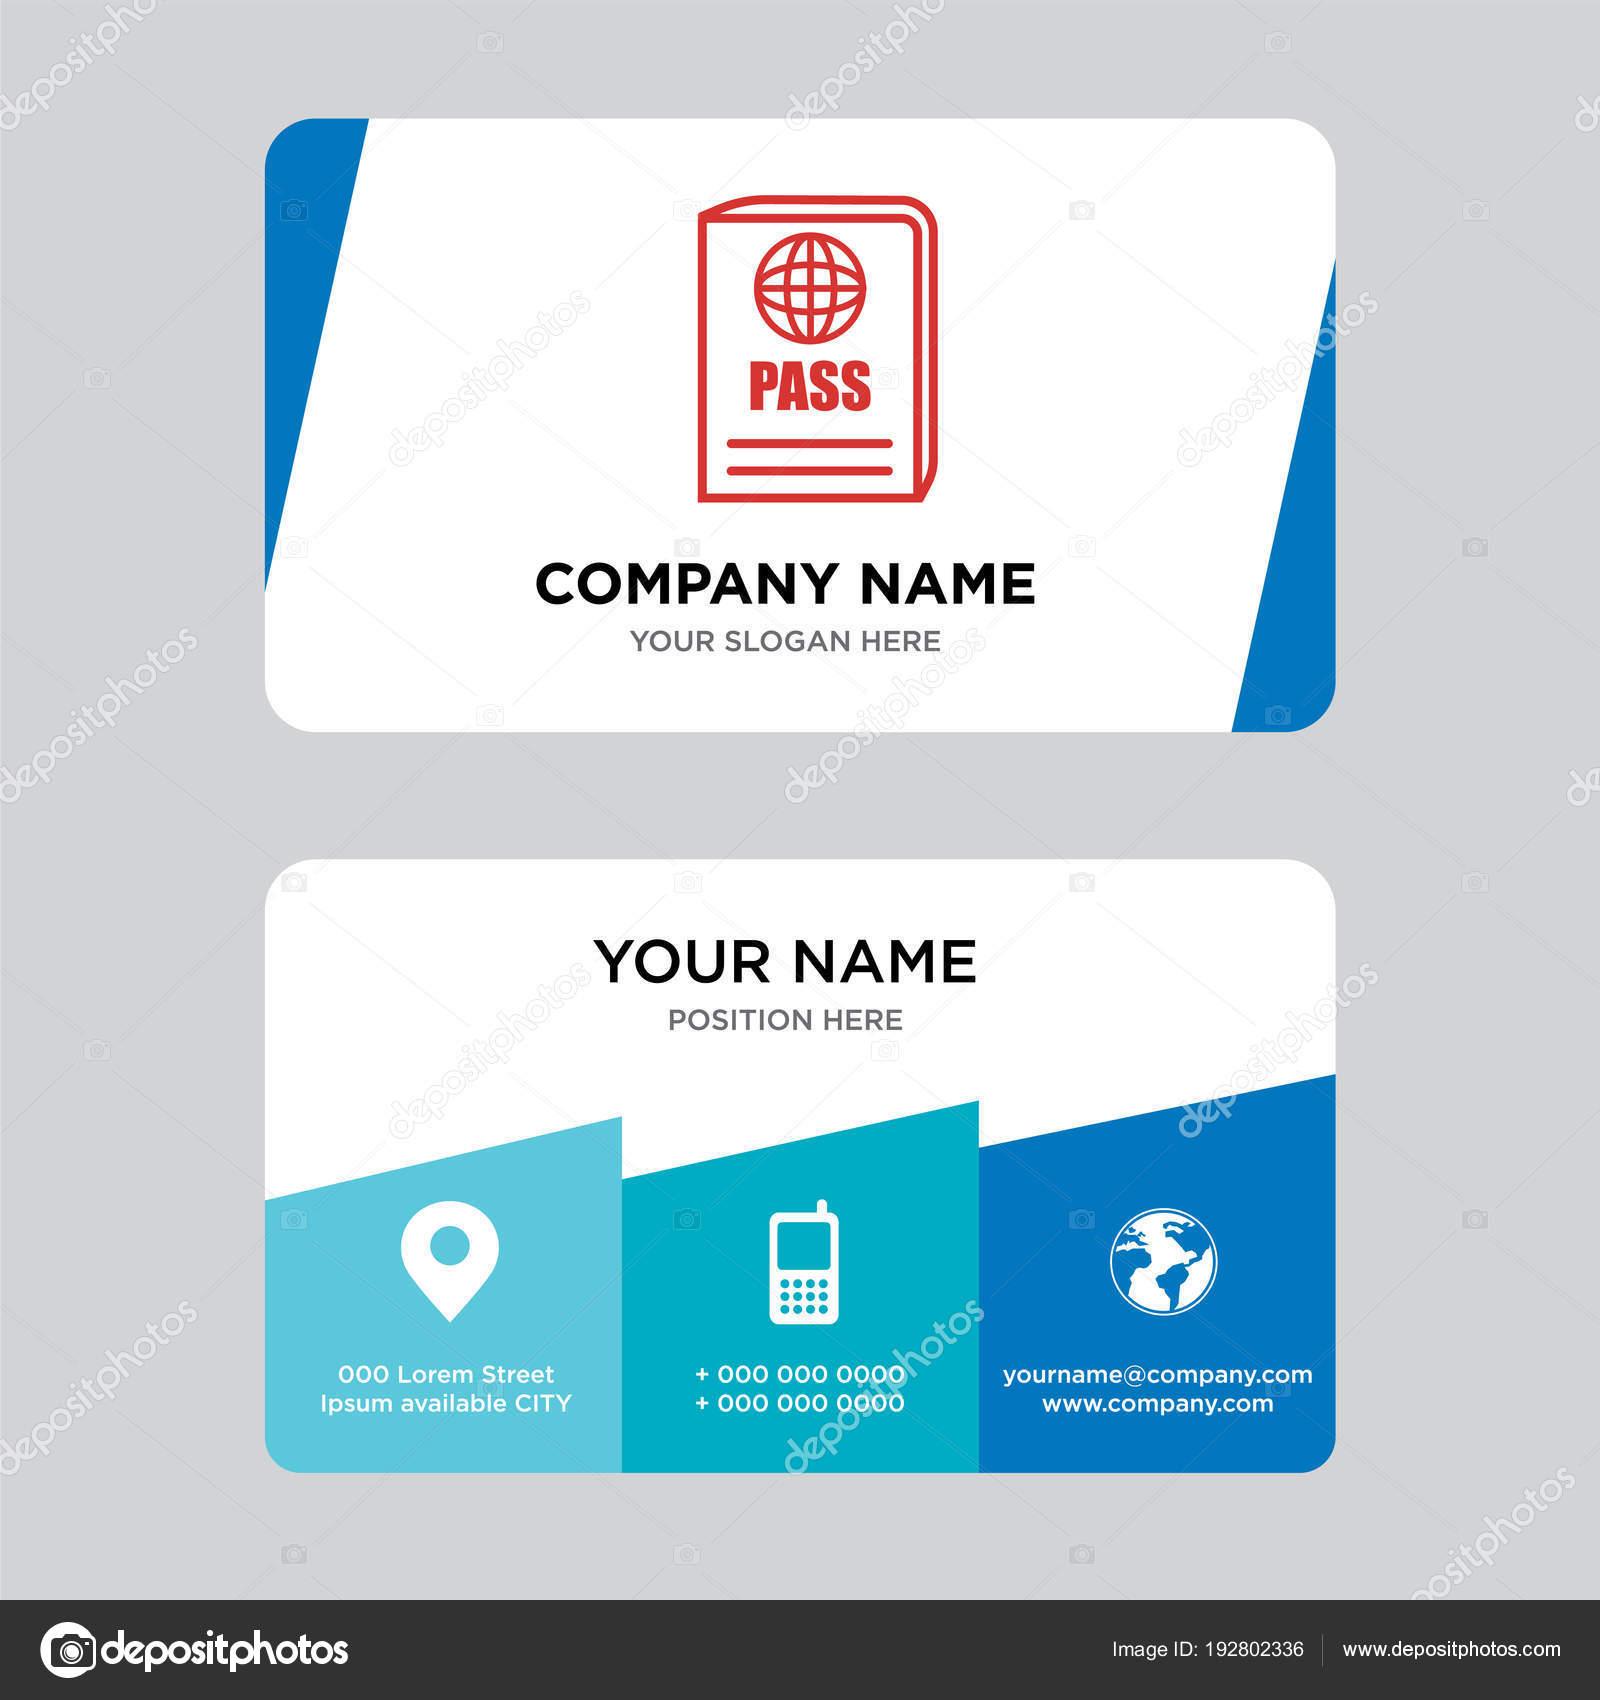 Passport business card design template stock vector passport business card design template stock vector colourmoves